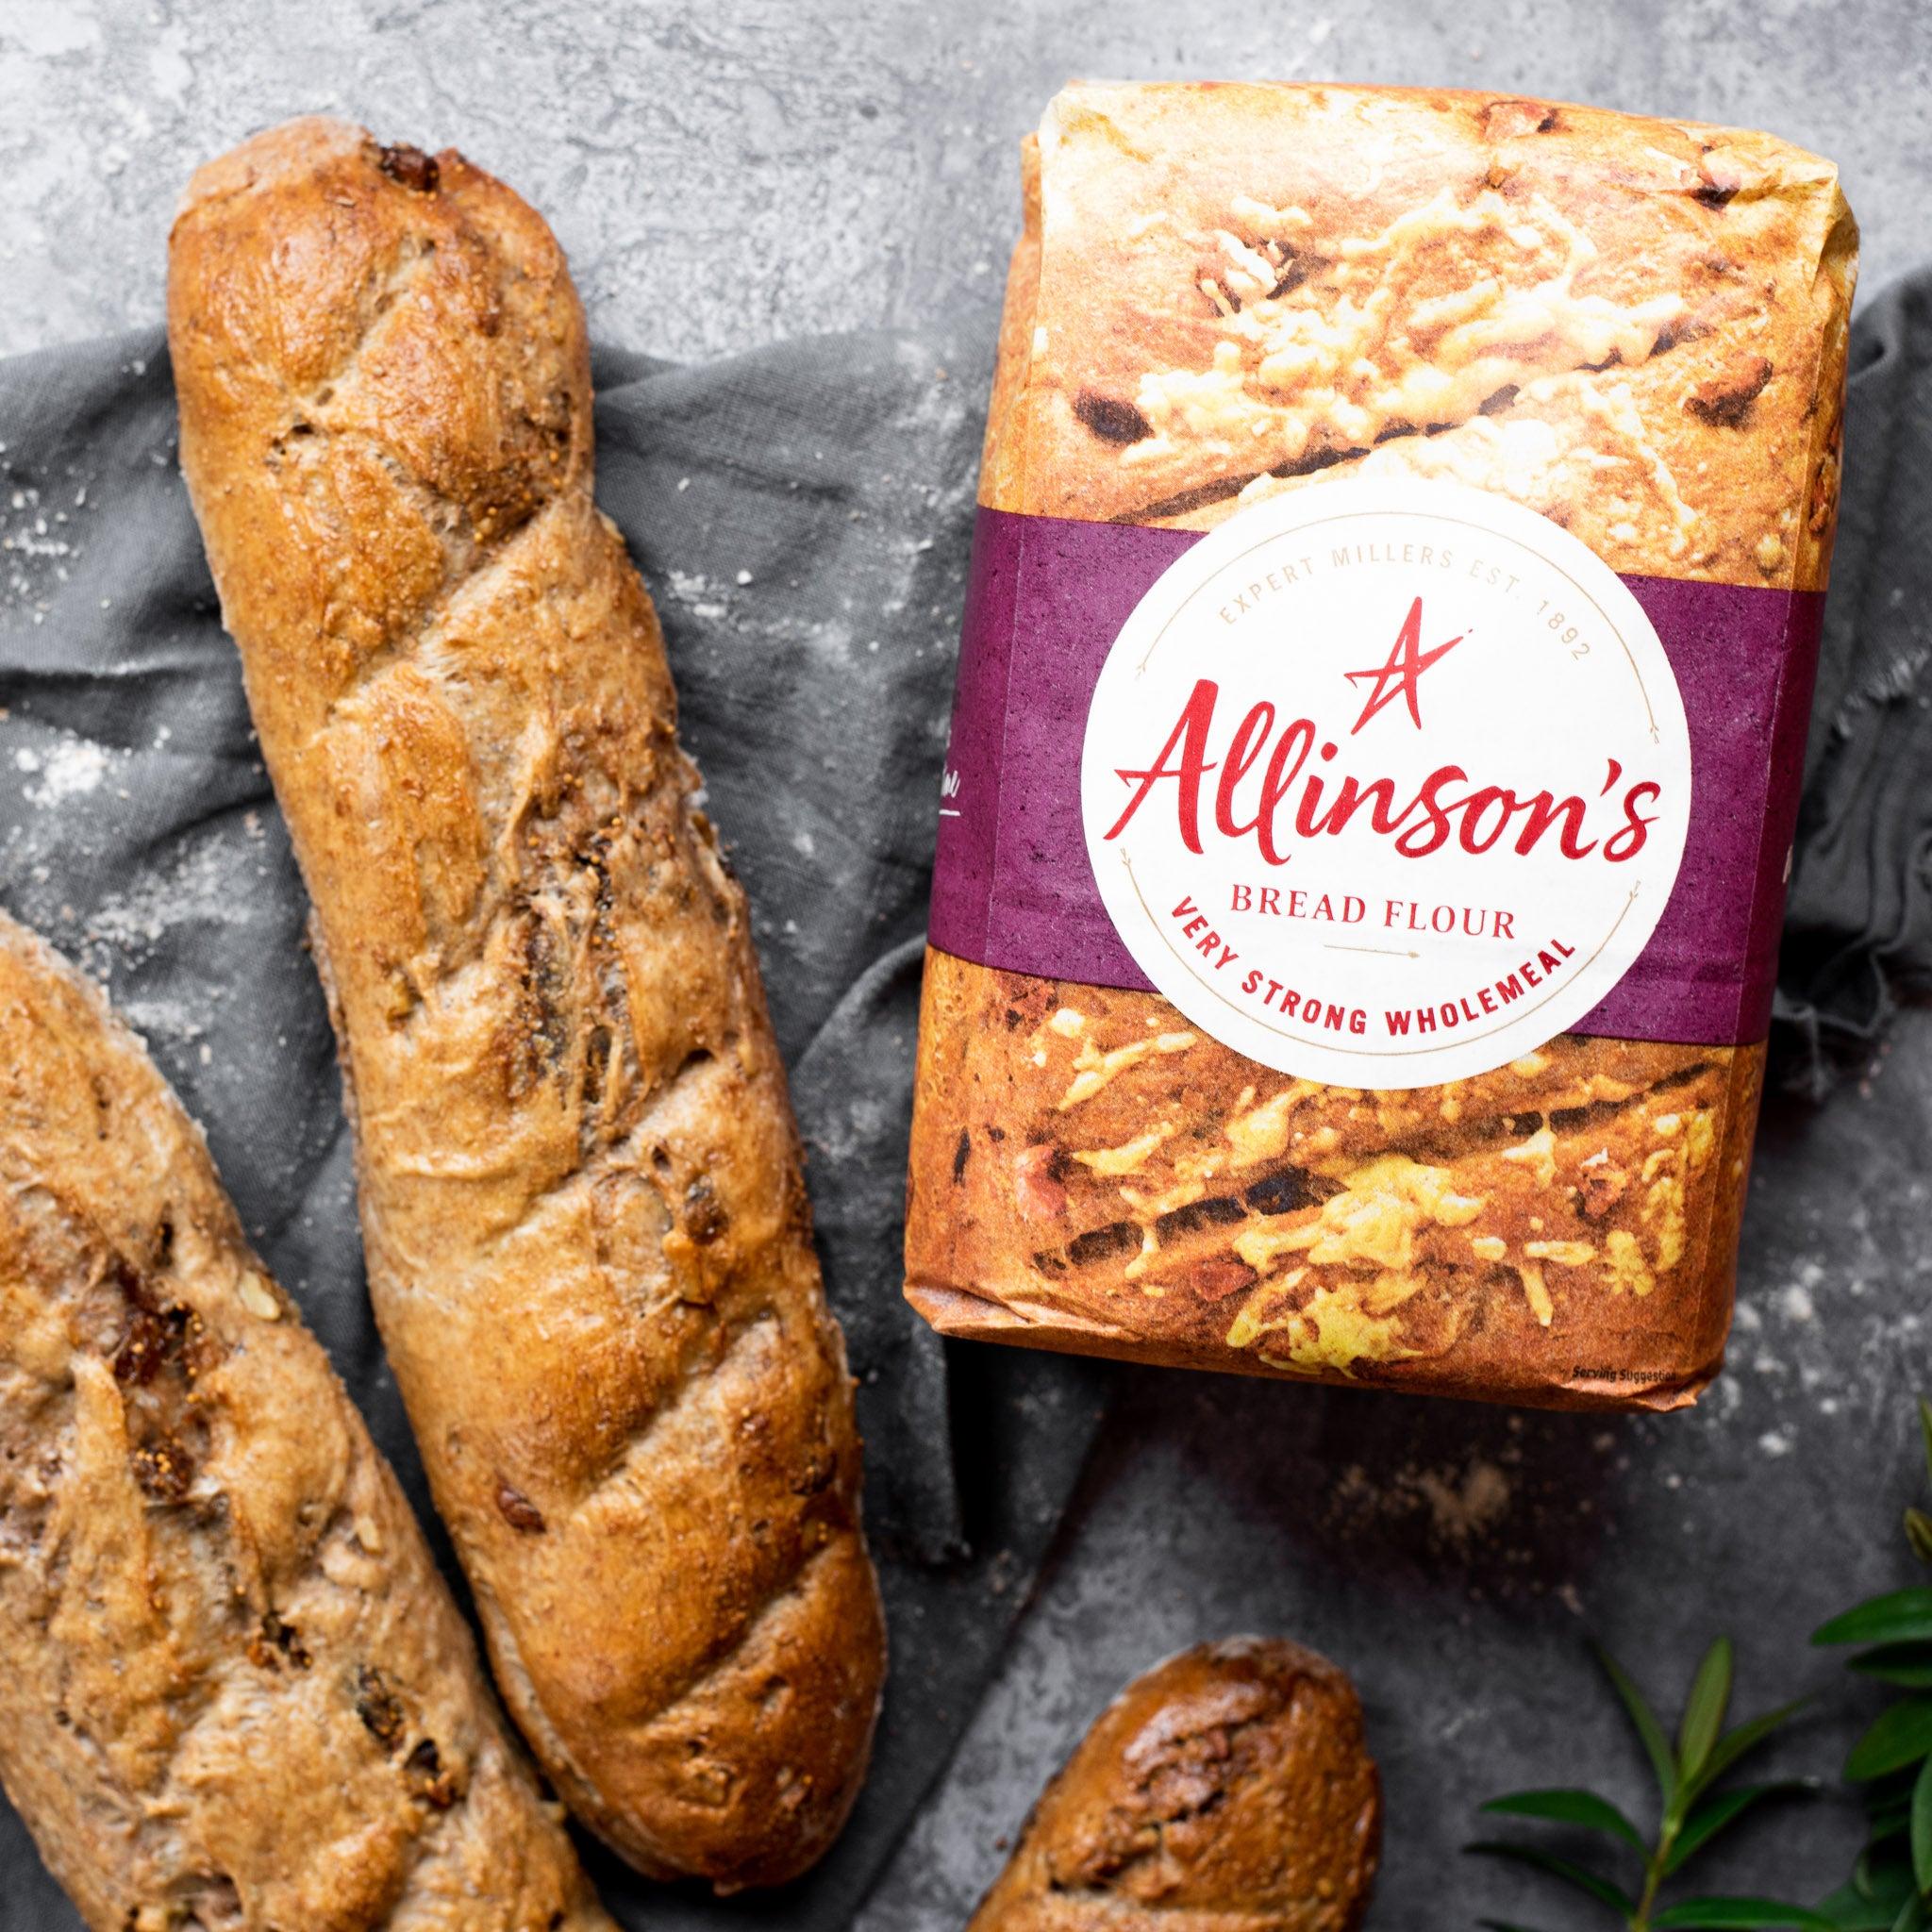 Allinsons-Fig-Walnut-Sticks-1-1-Baking-Mad-2.jpg